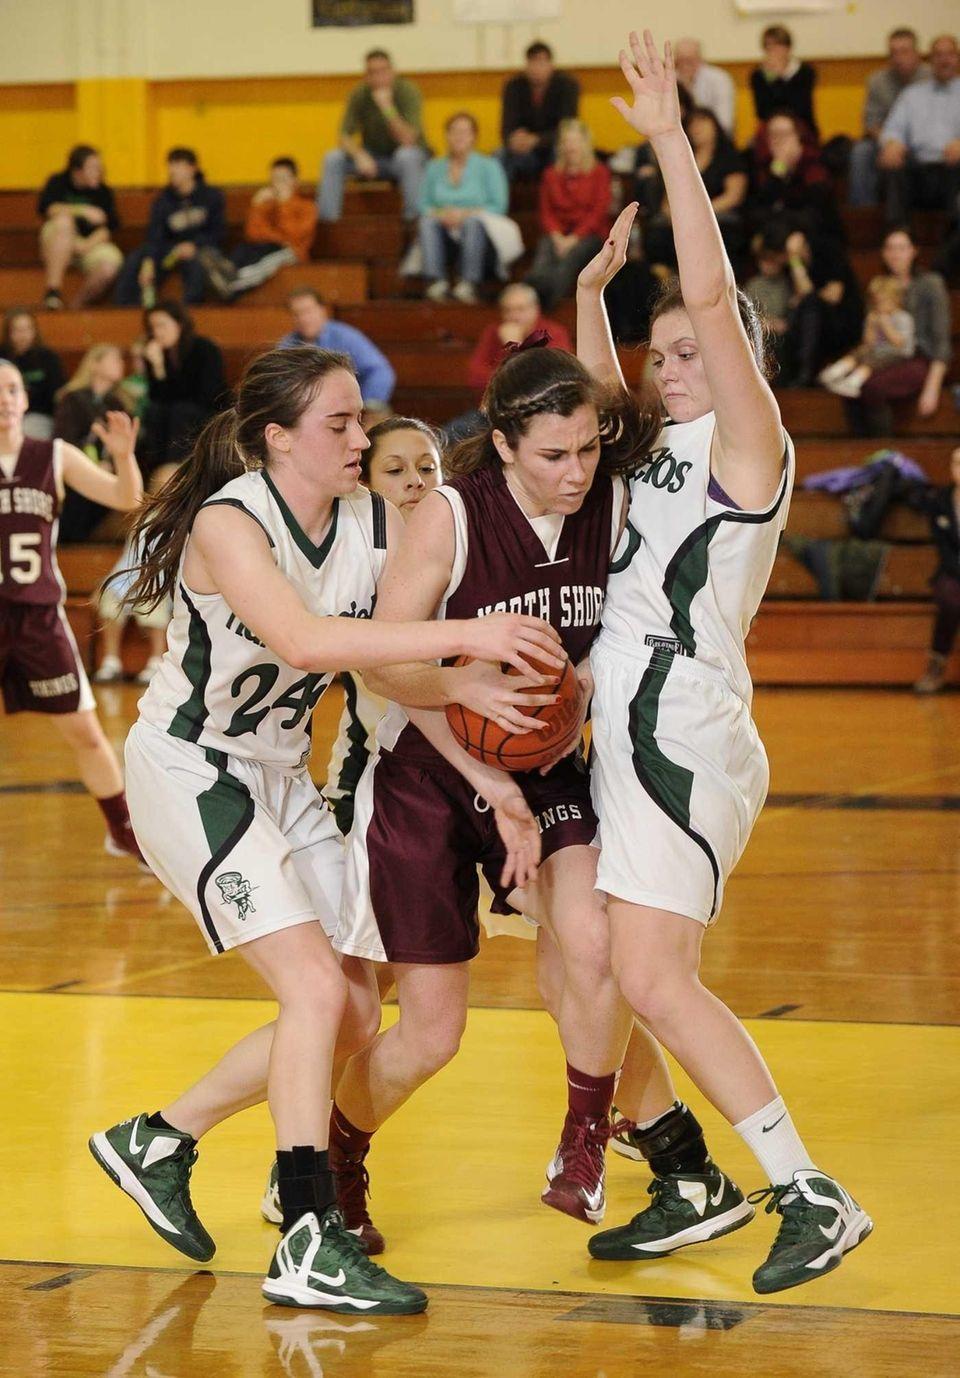 North Shore's Erin Sheerin drives the ball between